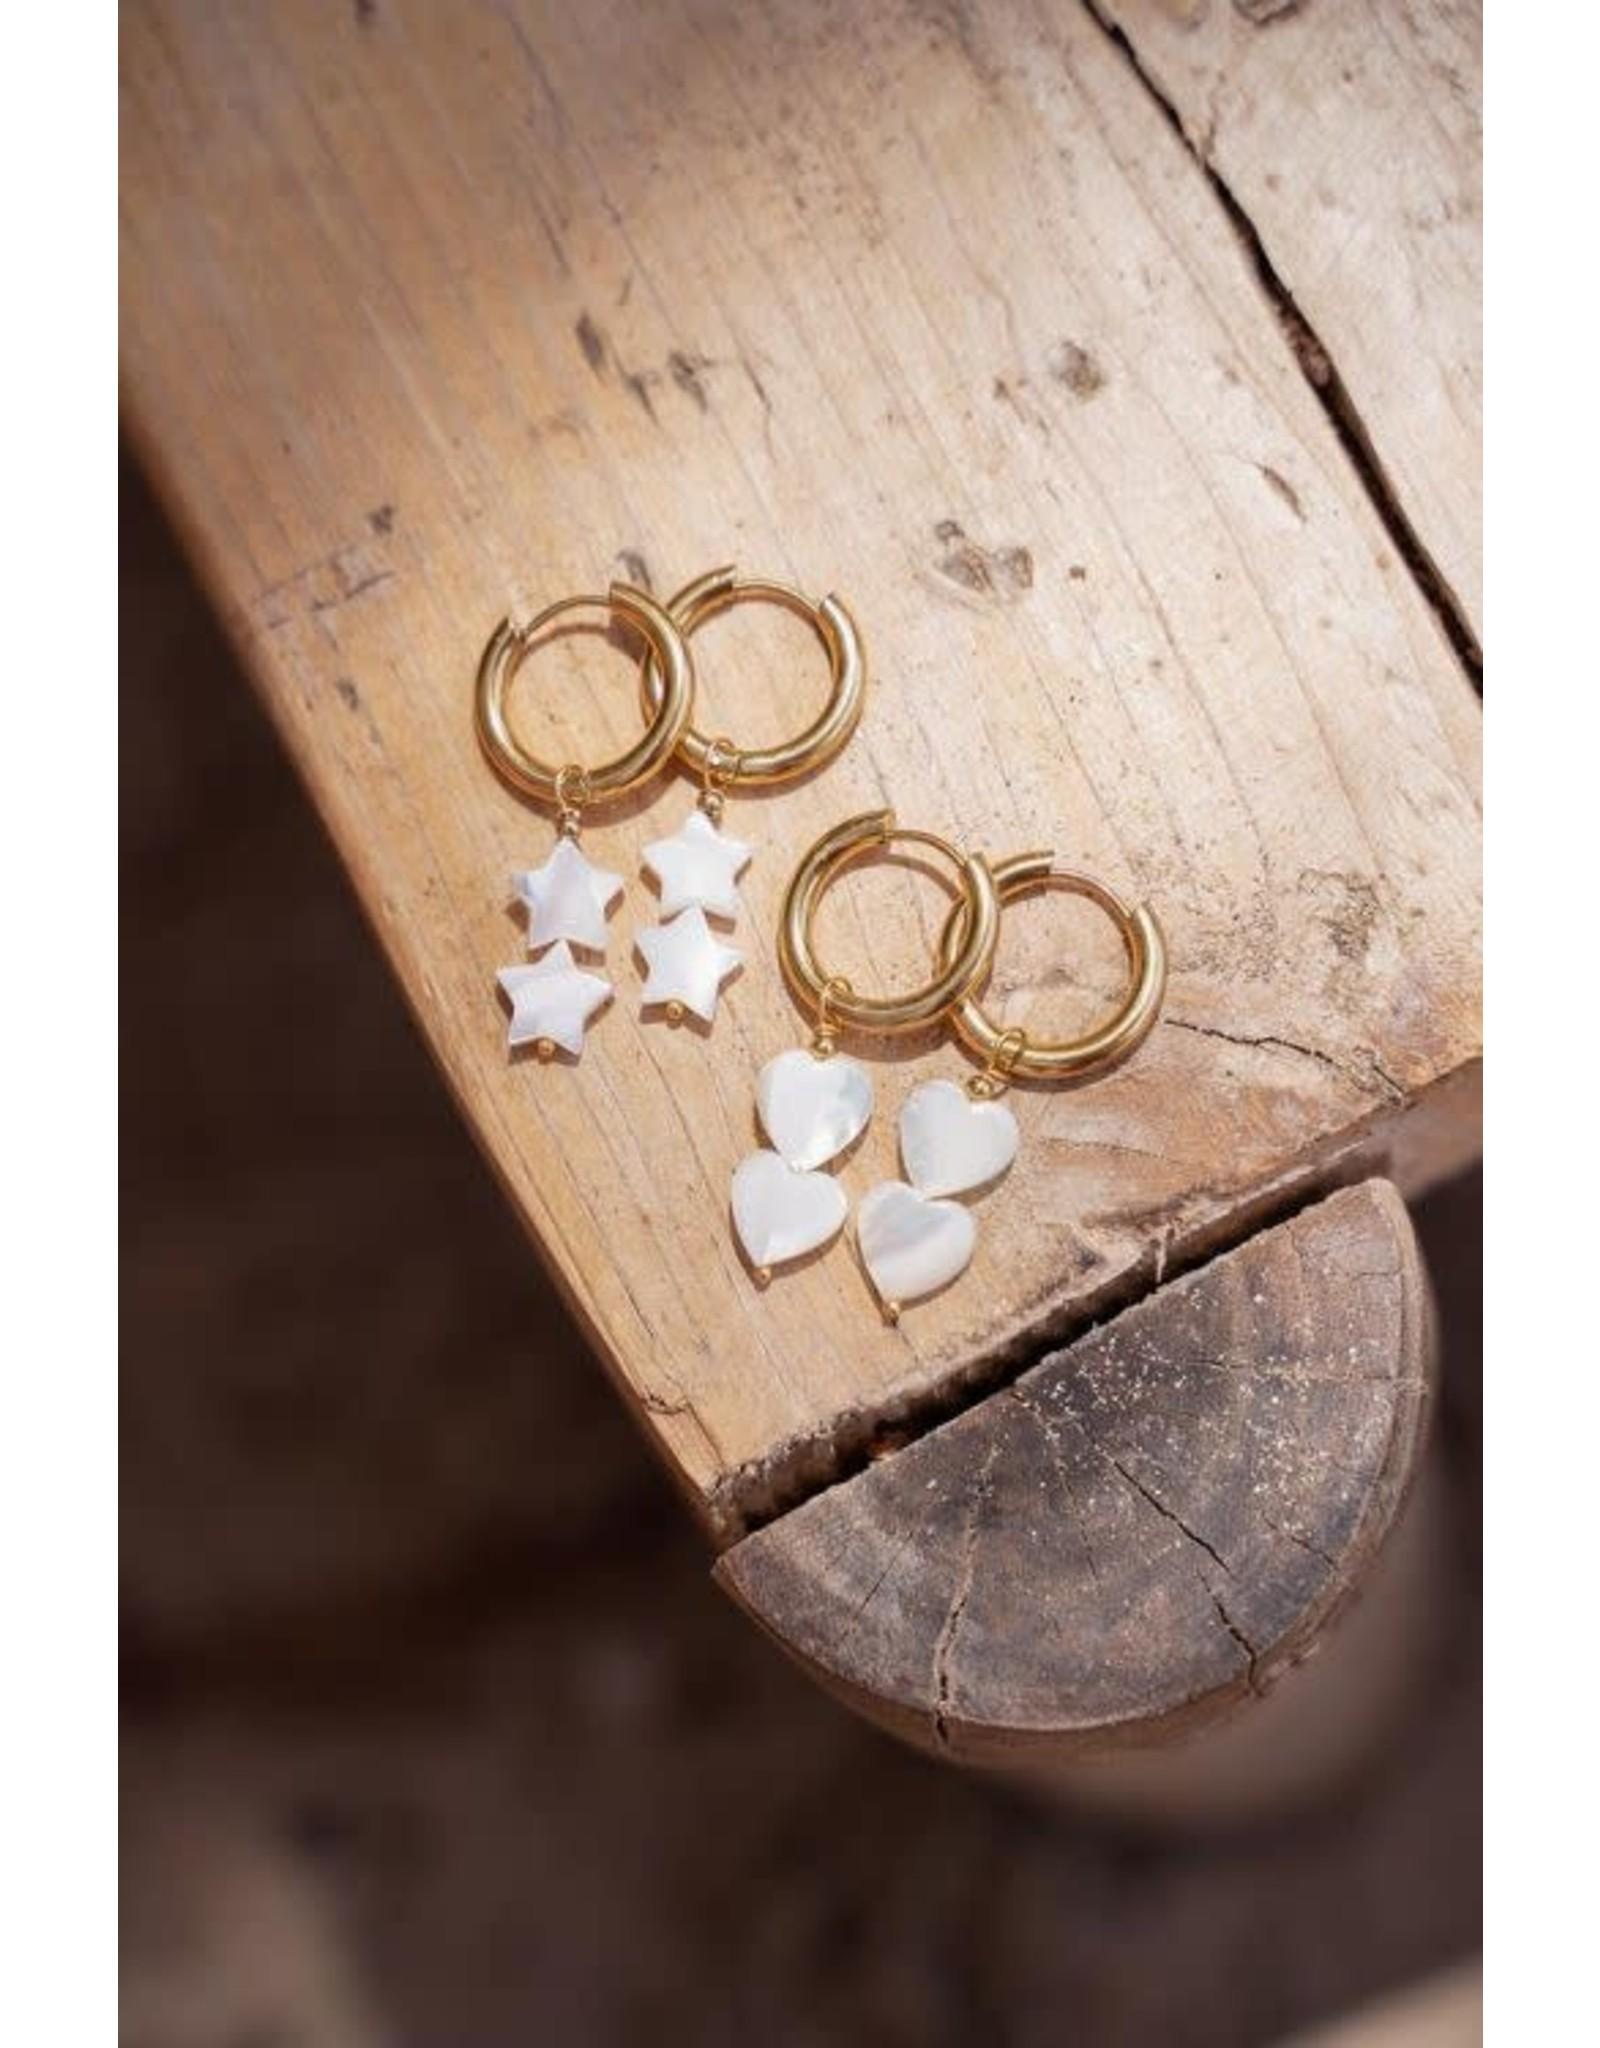 My Jewellery My Jewellery oorringen sterrtjes parels